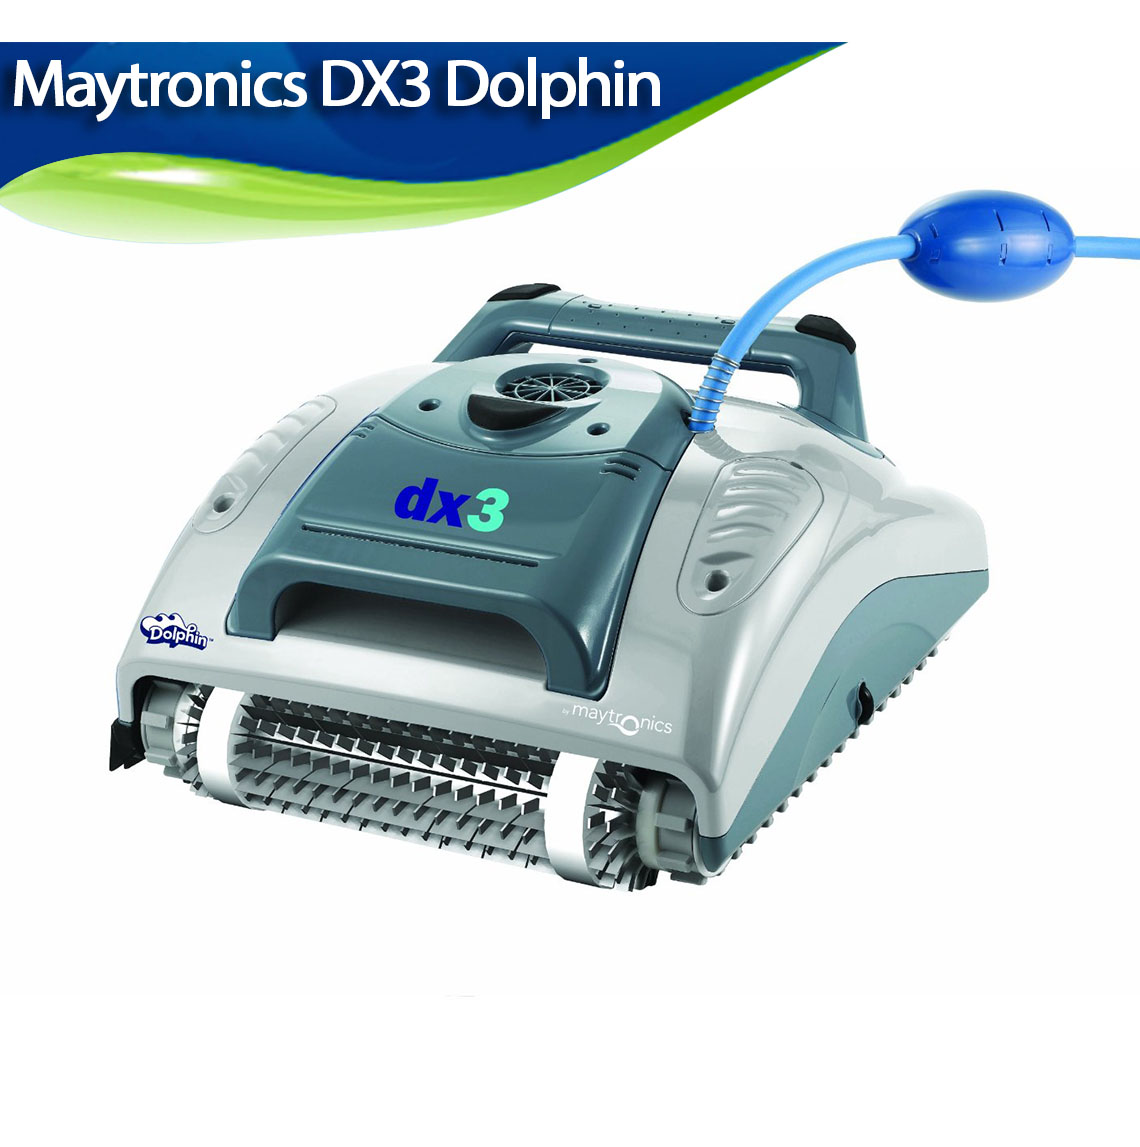 Maytronics DX3 Dolphin rpc